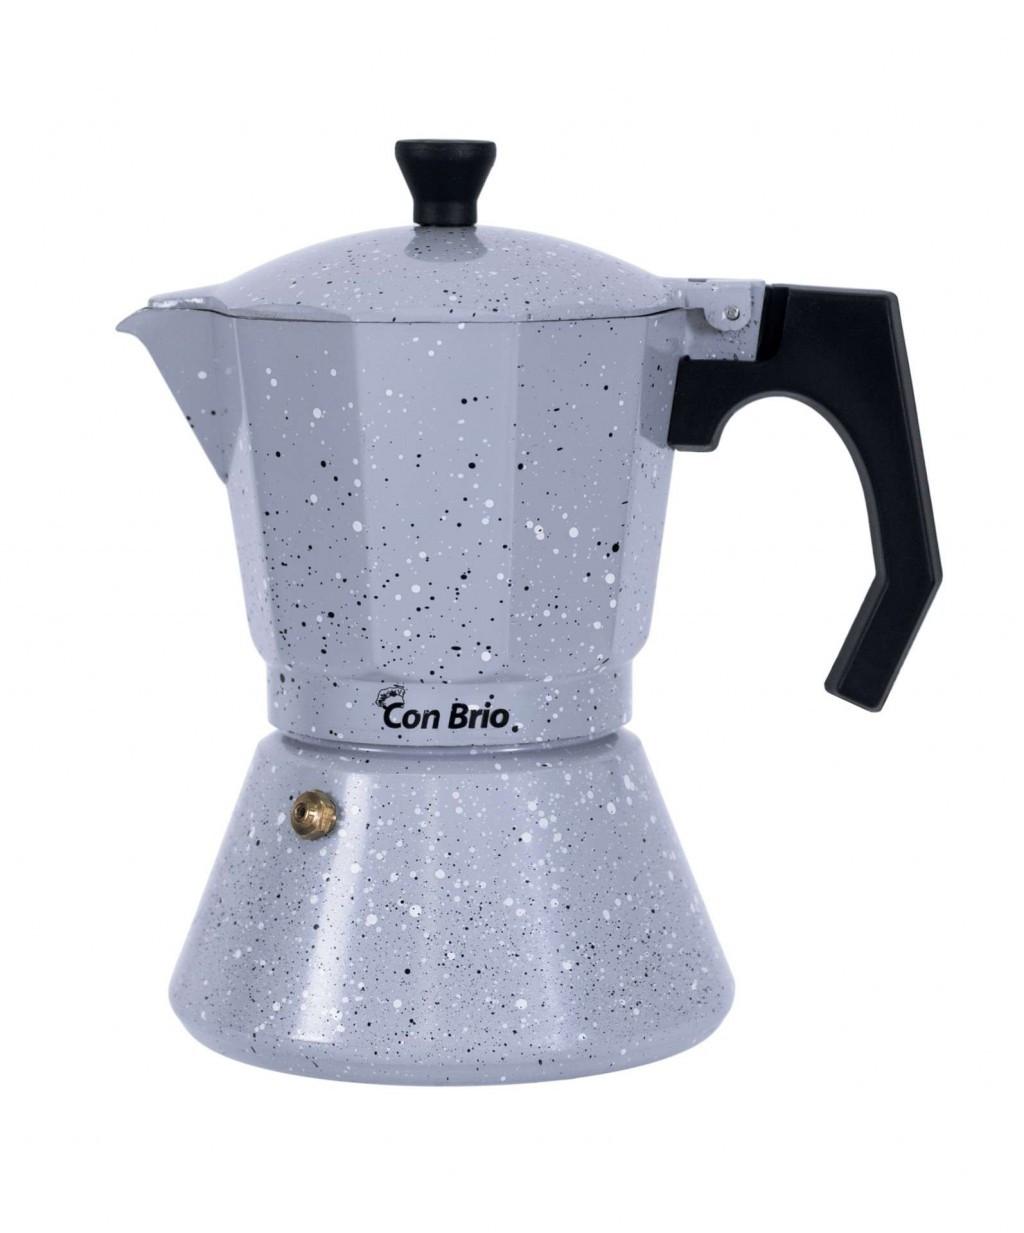 Гейзерная кофеварка con brio CB 6706 (Кон Брио) (6 чашек)